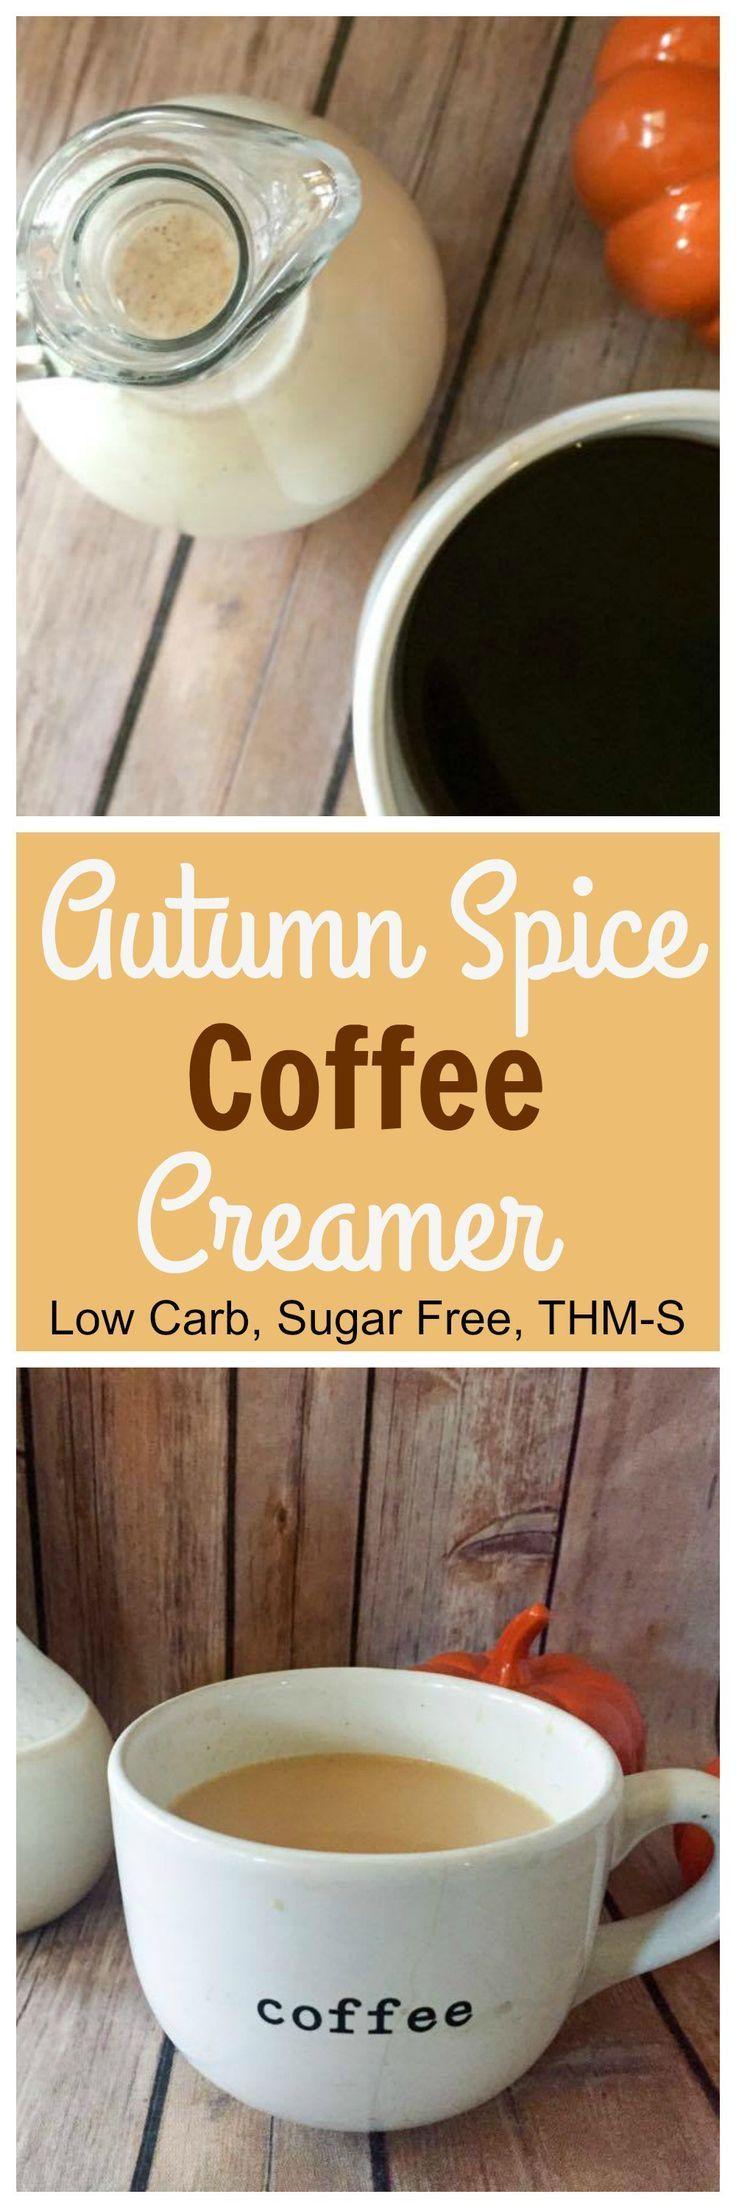 Autumn Spice Coffee Creamer (Low Carb, THMS, Sugar Free